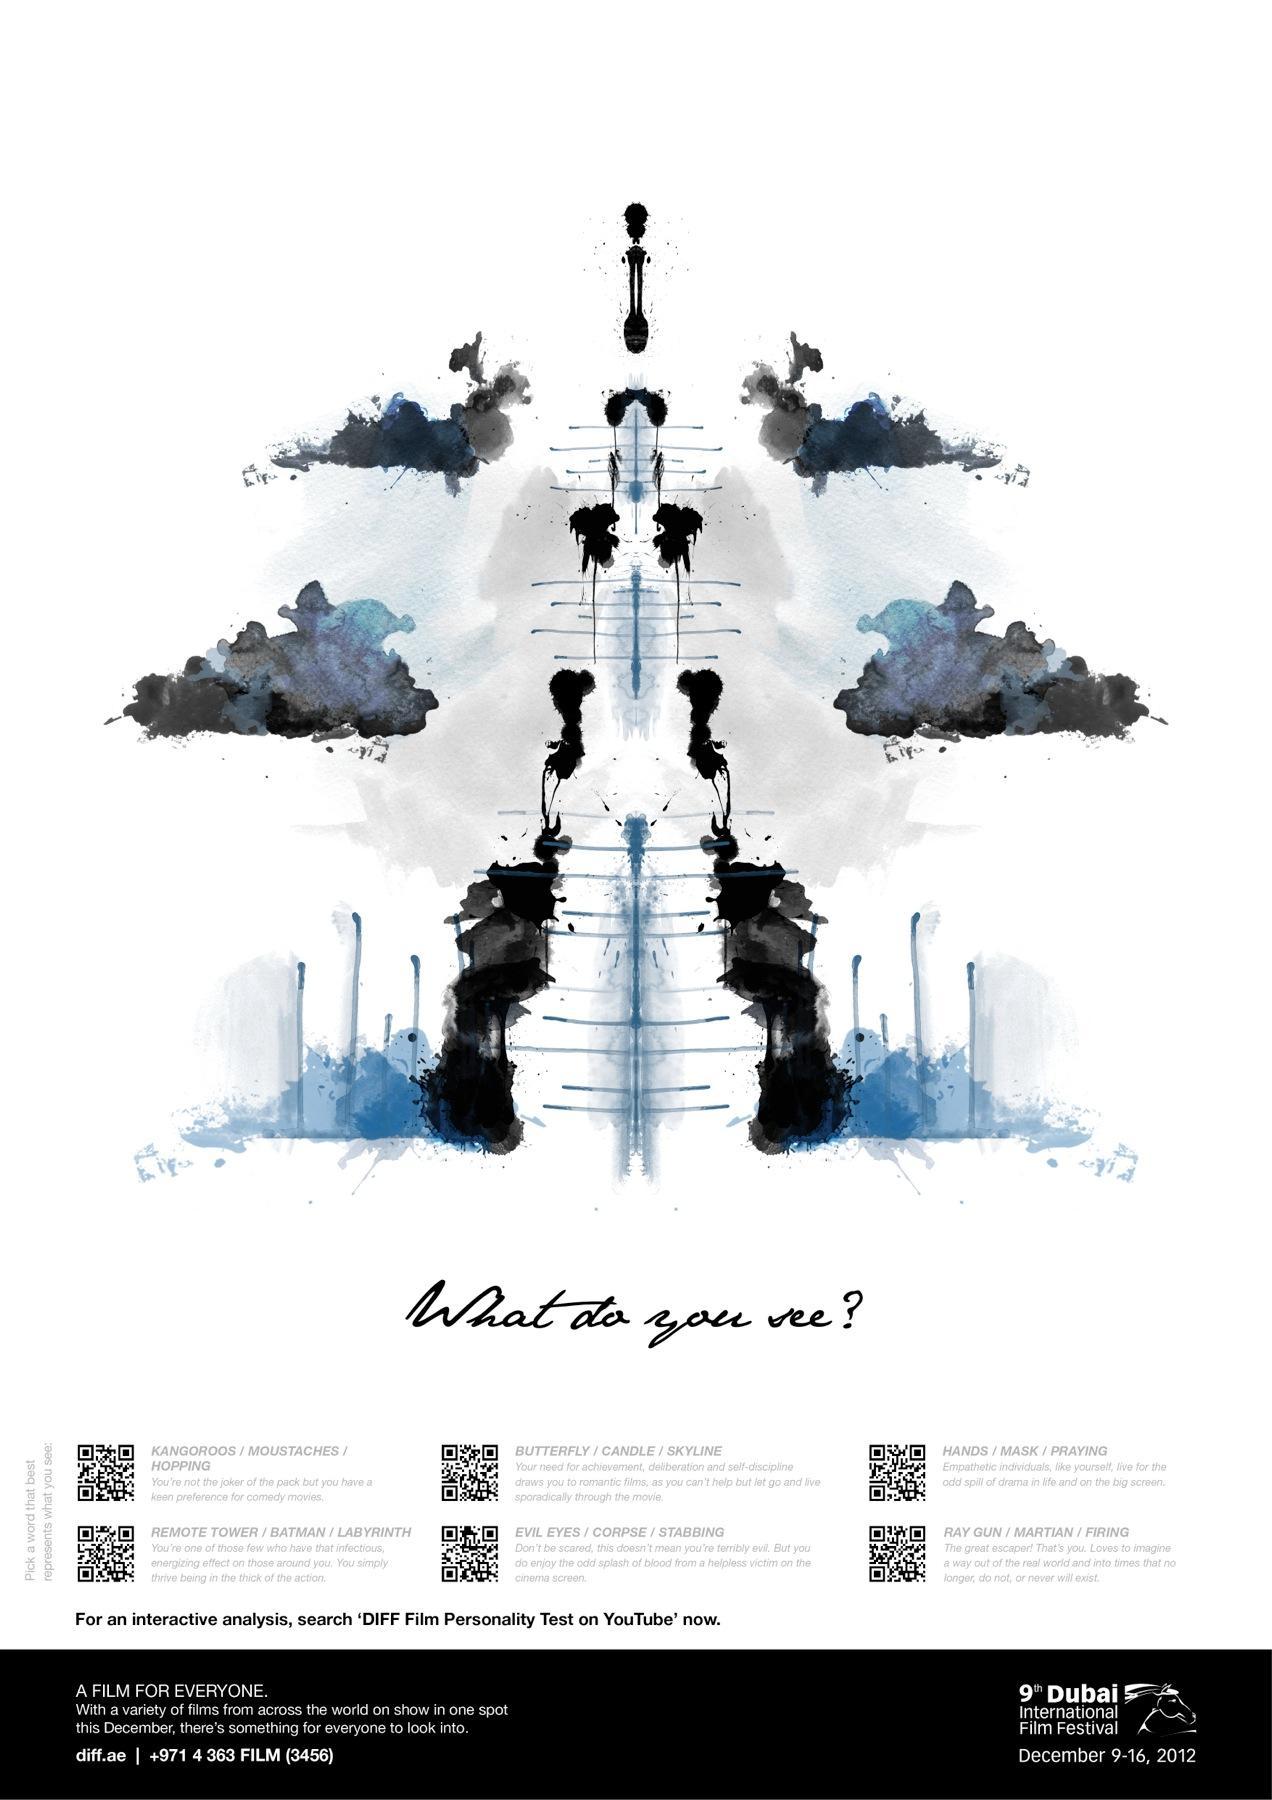 Dubai International Film Festival Outdoor Ad -  What do you see, 9